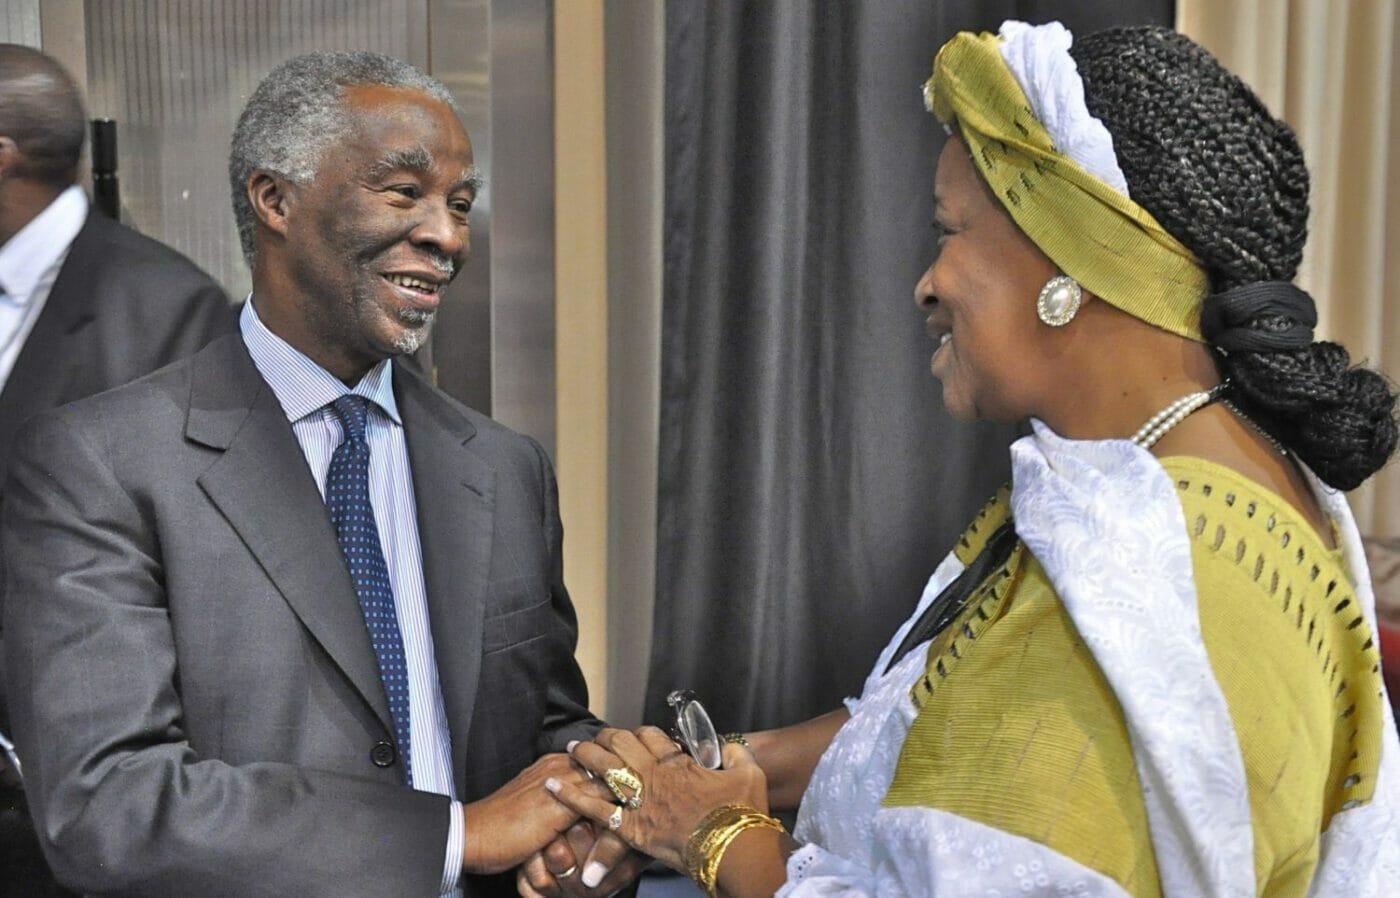 Former South African president Thabo Mbeki shakes hands with Ambassador Bennett